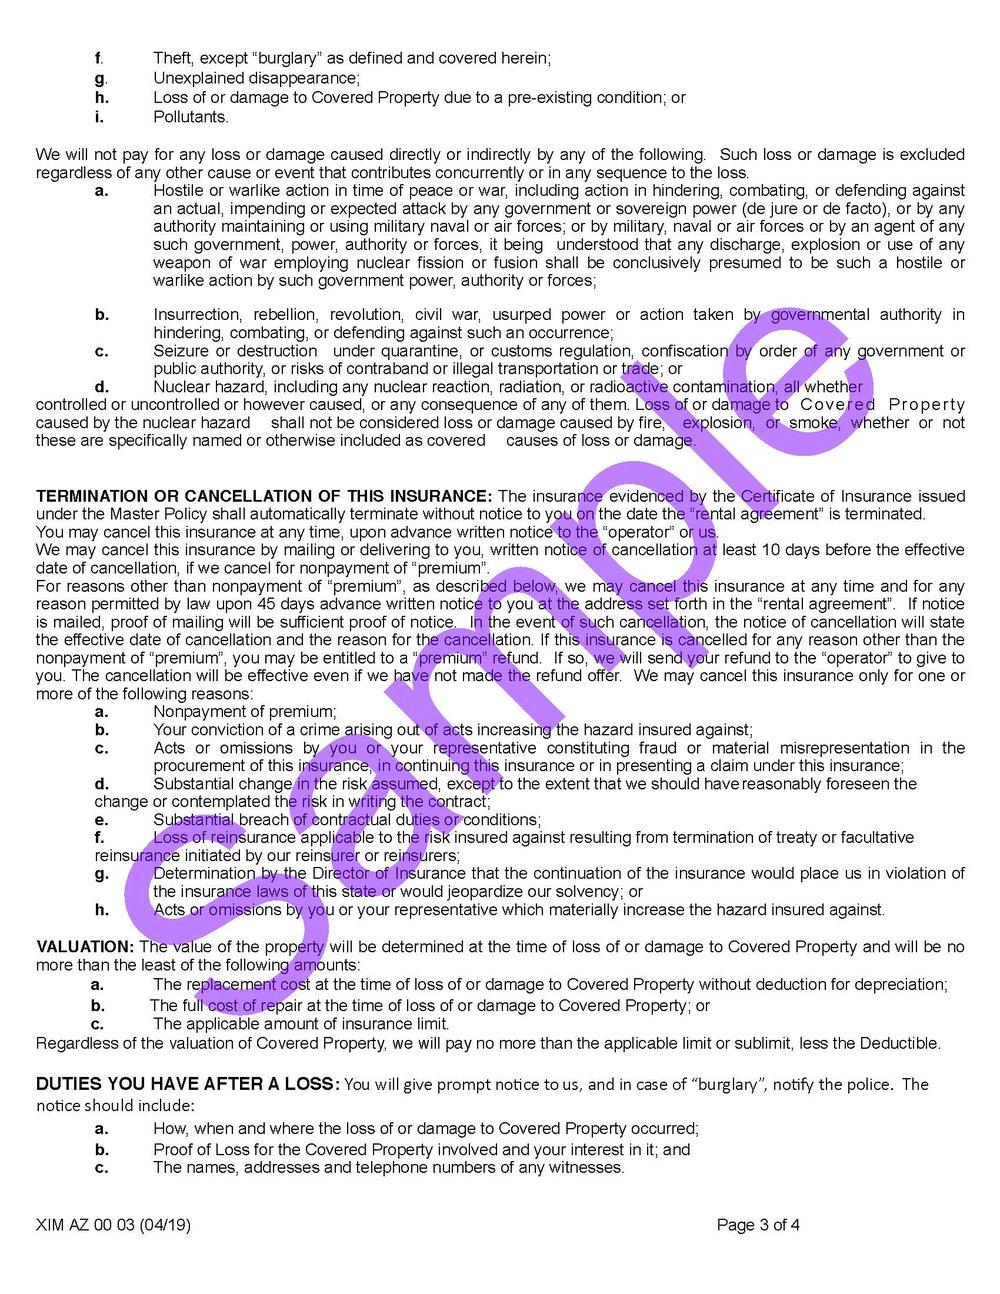 XIM AZ 00 03 04 19 Arizona Certificate of Insurance_Page_3.jpg